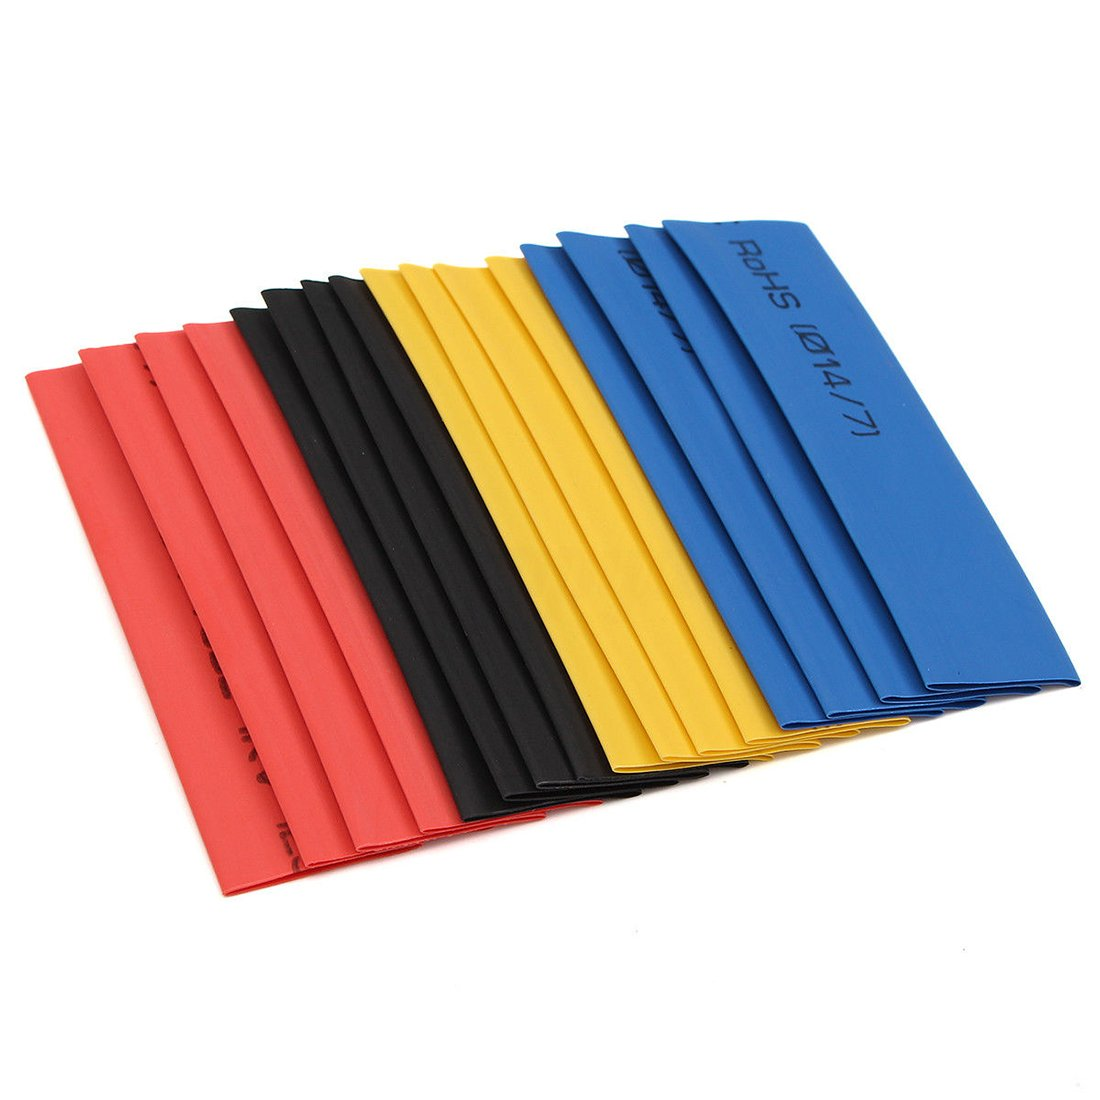 R 328Pcs Car Electrical Cable Heat Shrink Tube Tubing Wrap Sleeve Assortment TOOGOO